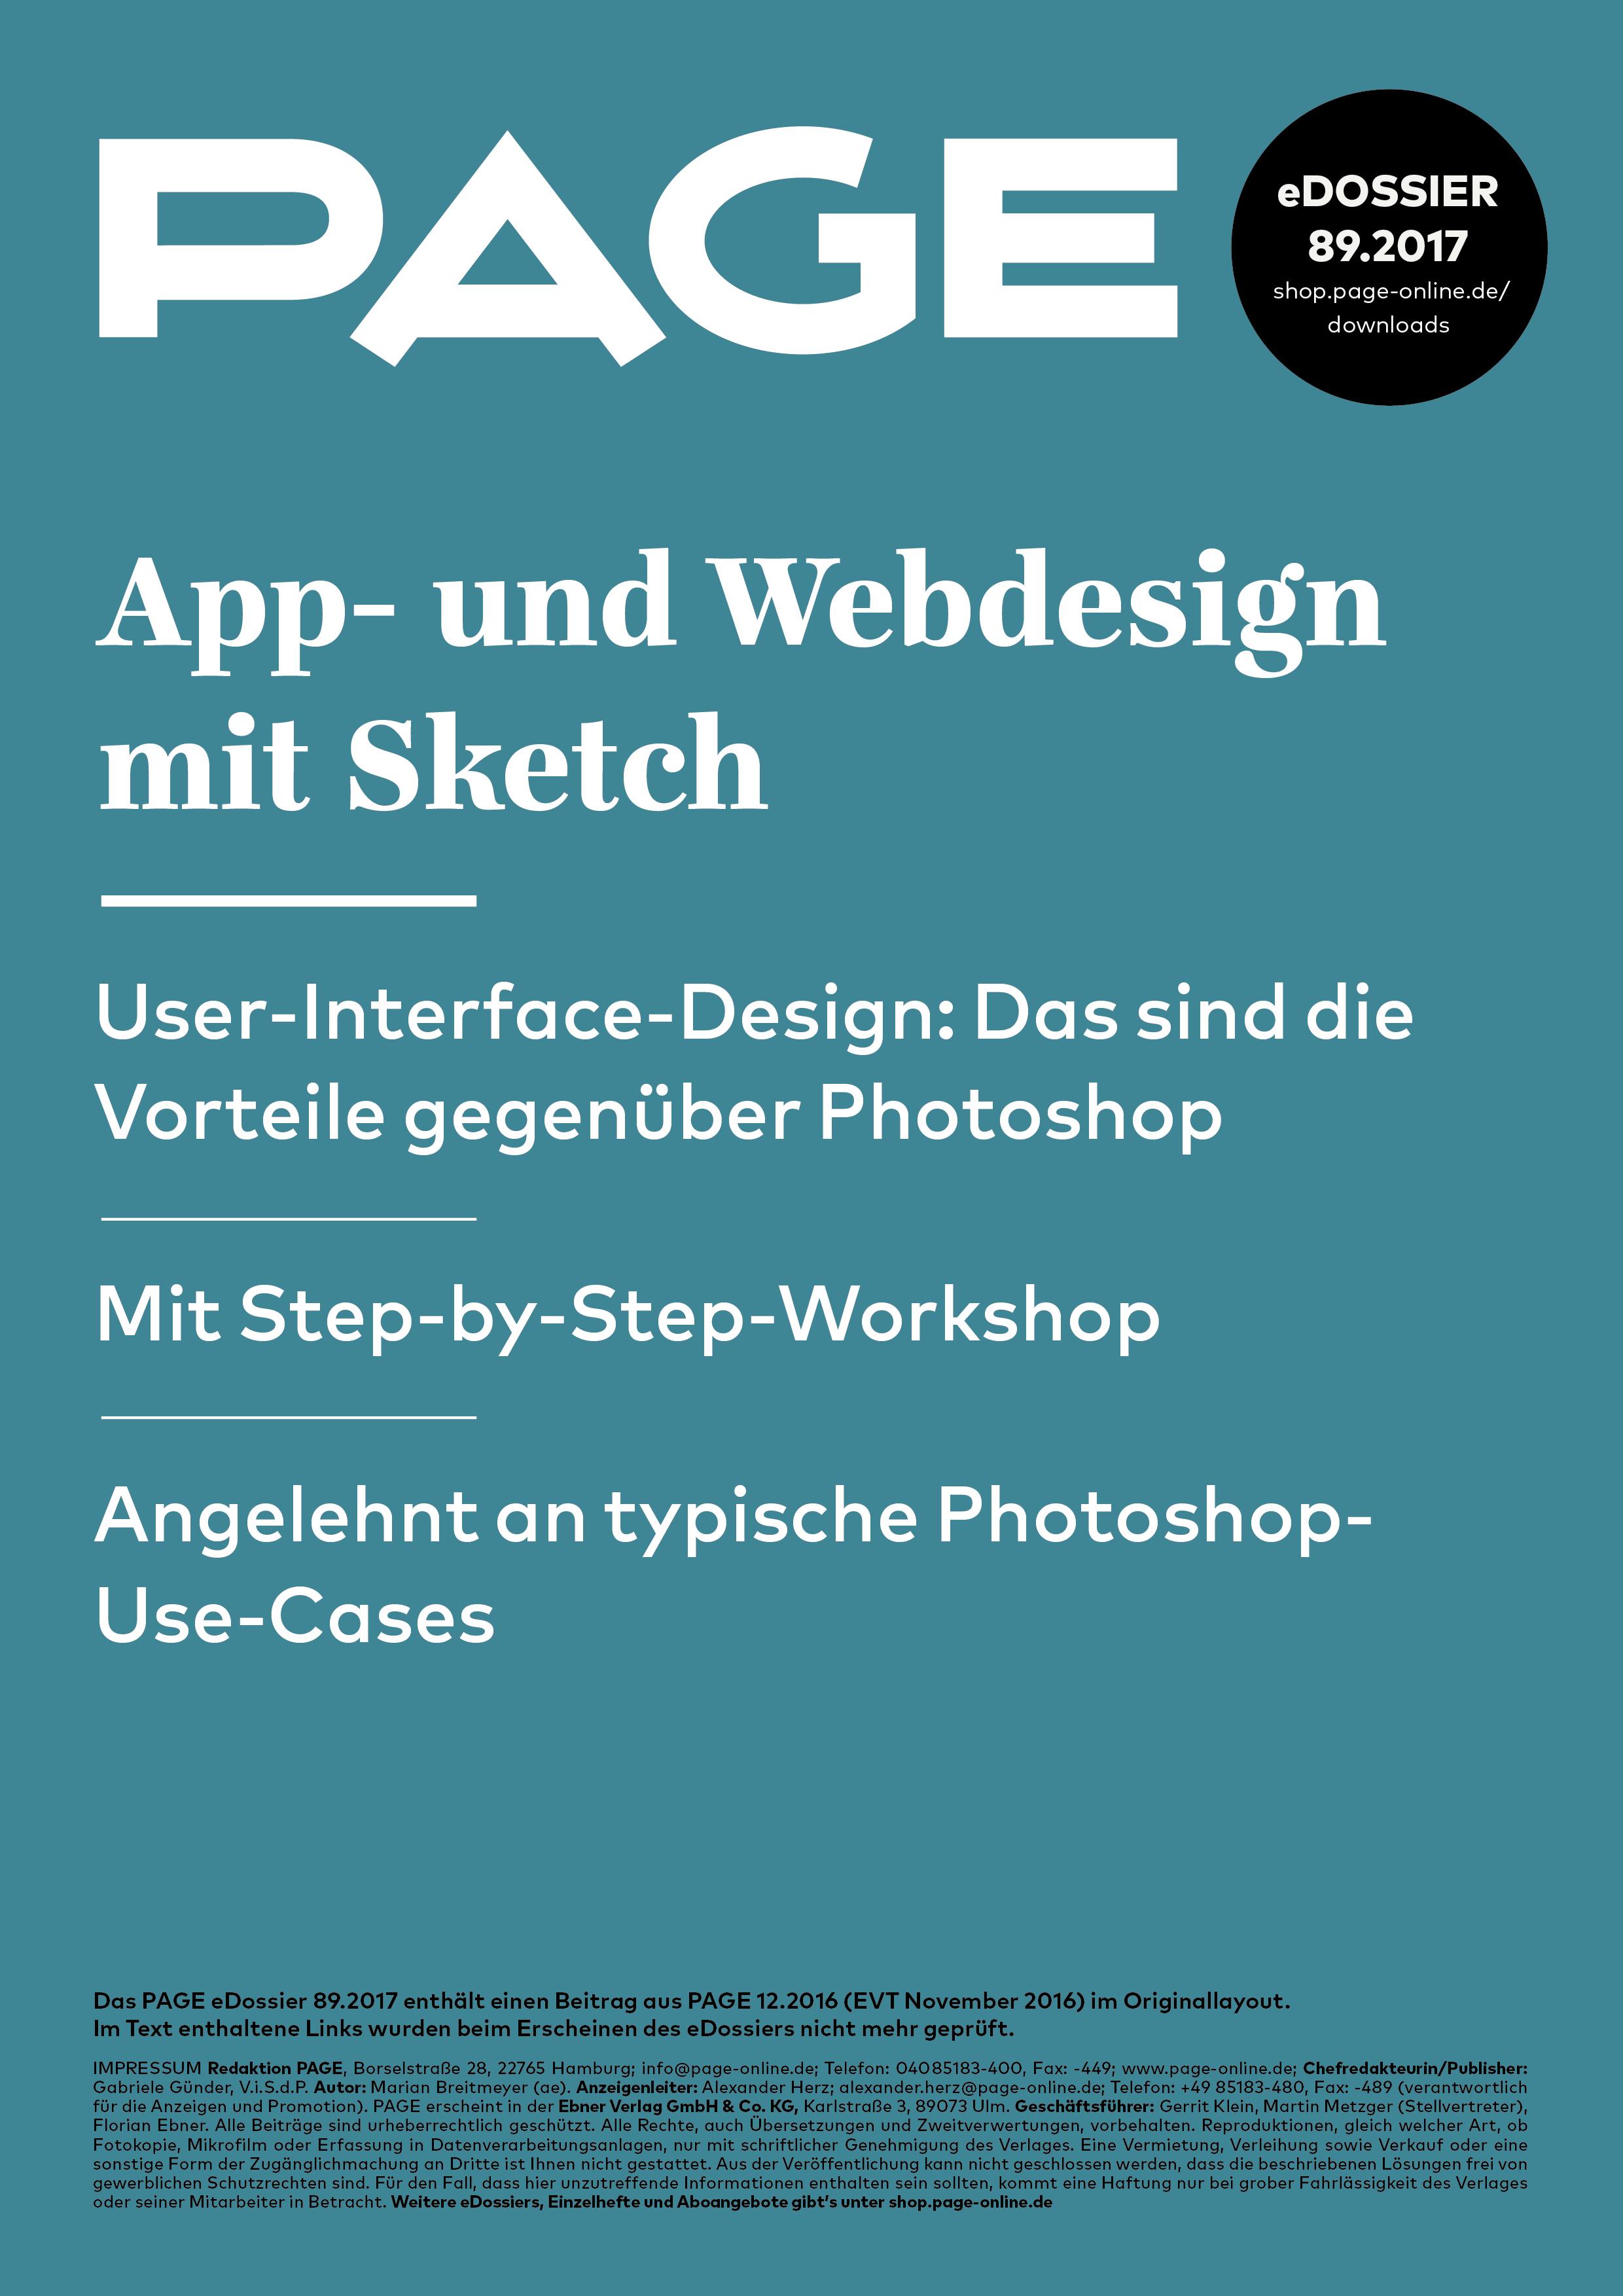 Sketch, Adobe Photoshop, Webdesign, Workshop, Tutorial, App Design, User Interface Design, UI Design